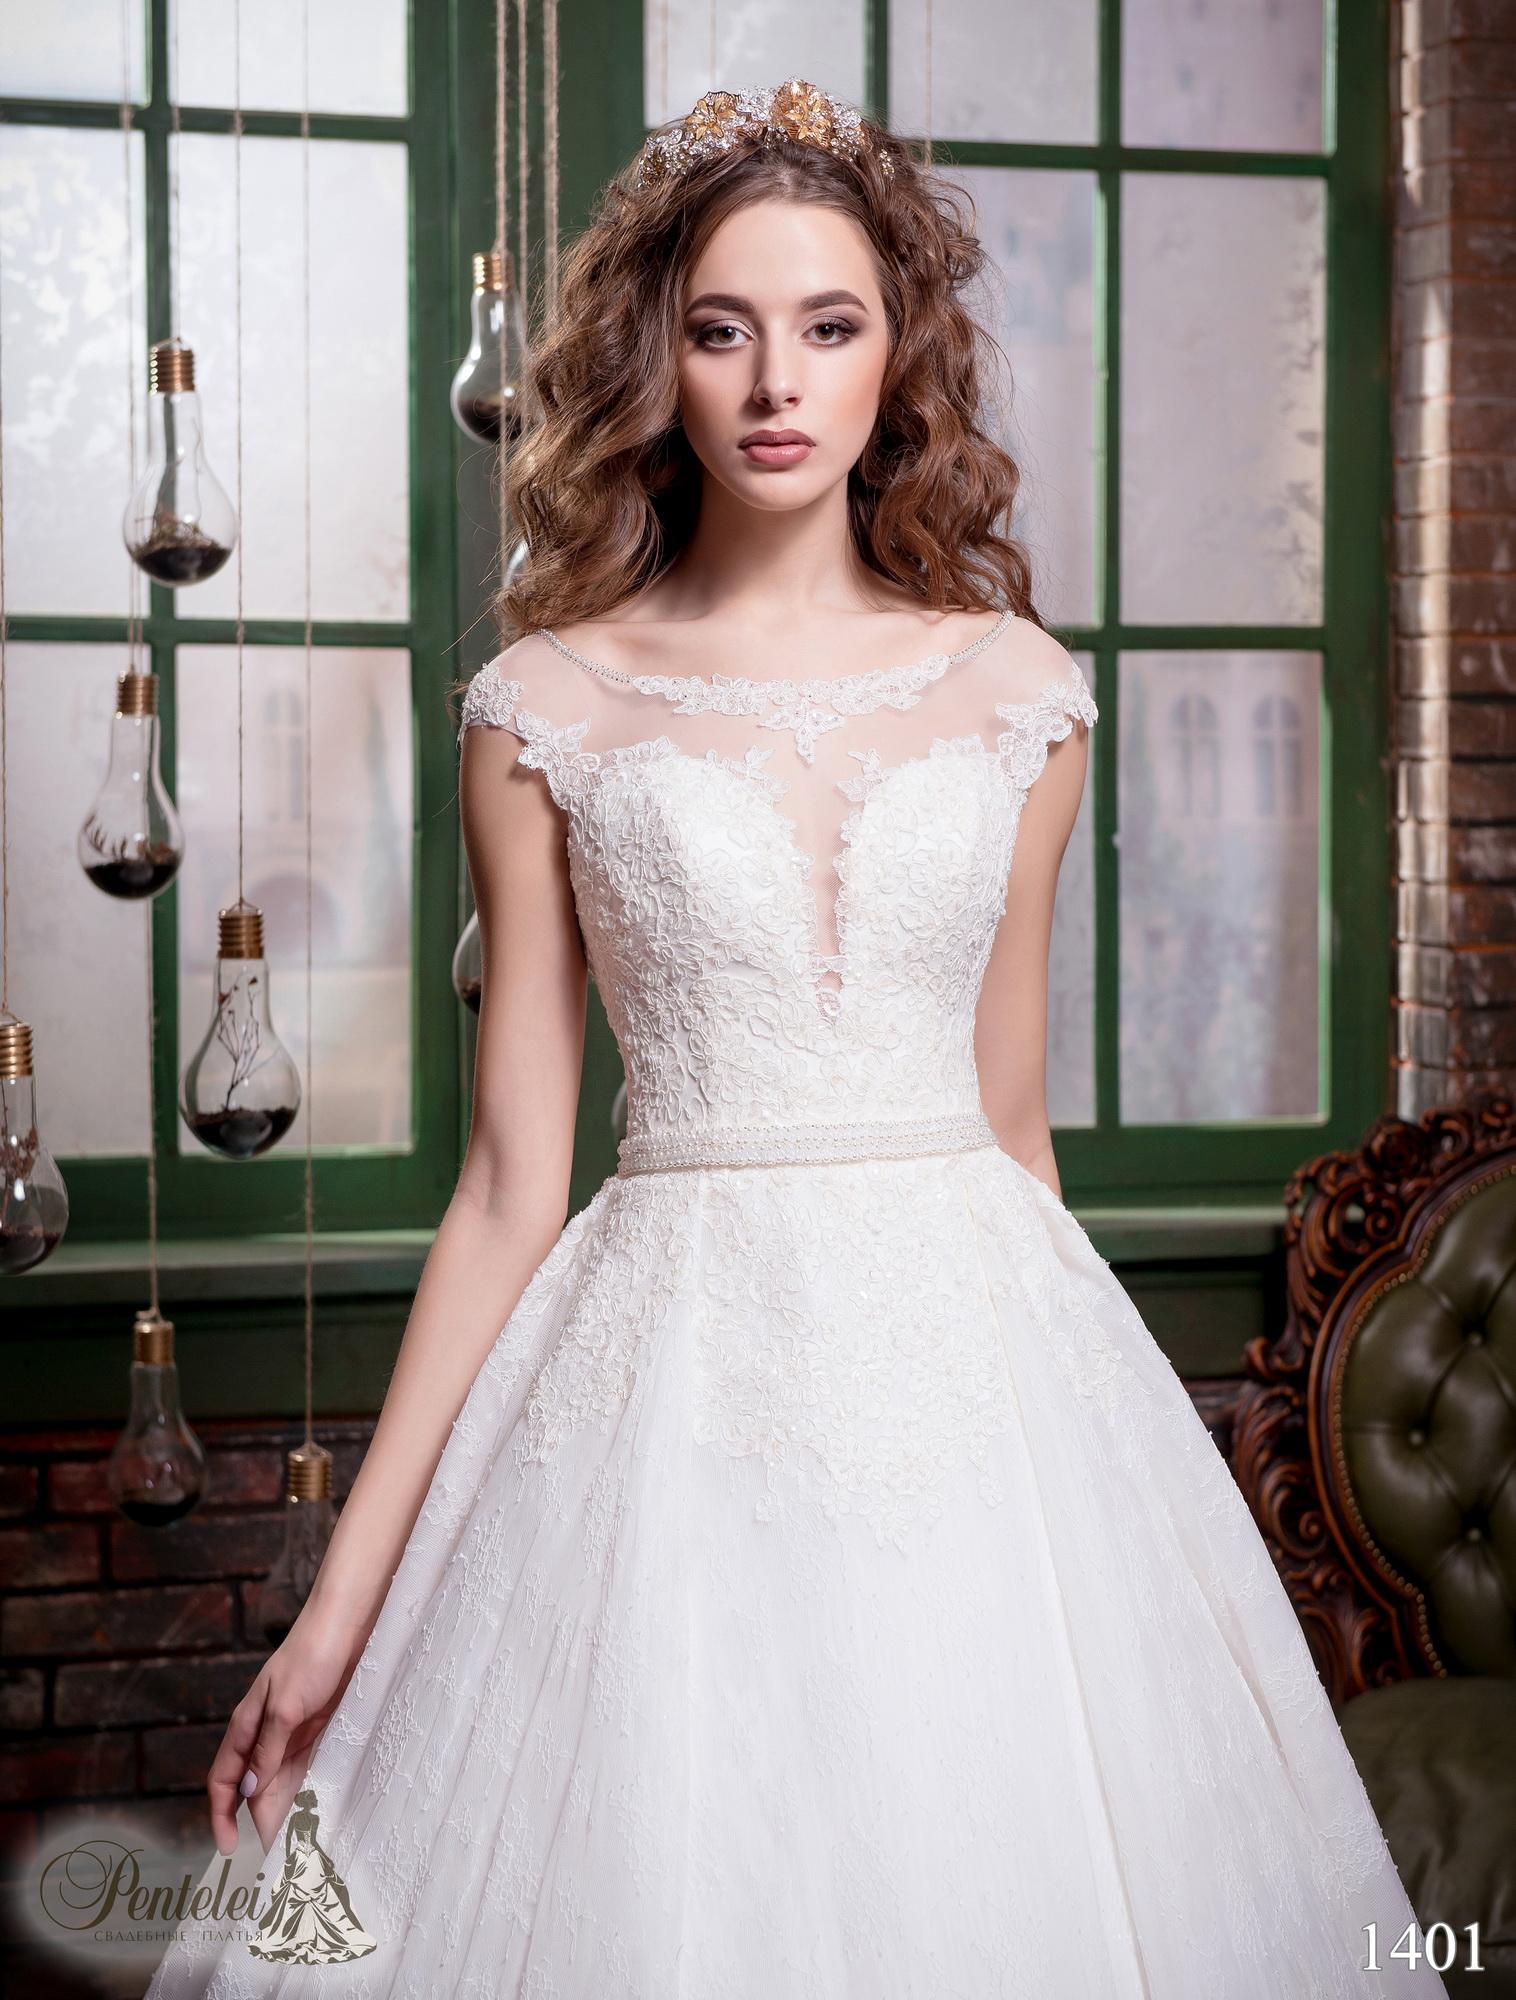 1401 | Buy wedding dresses wholesale from Pentelei